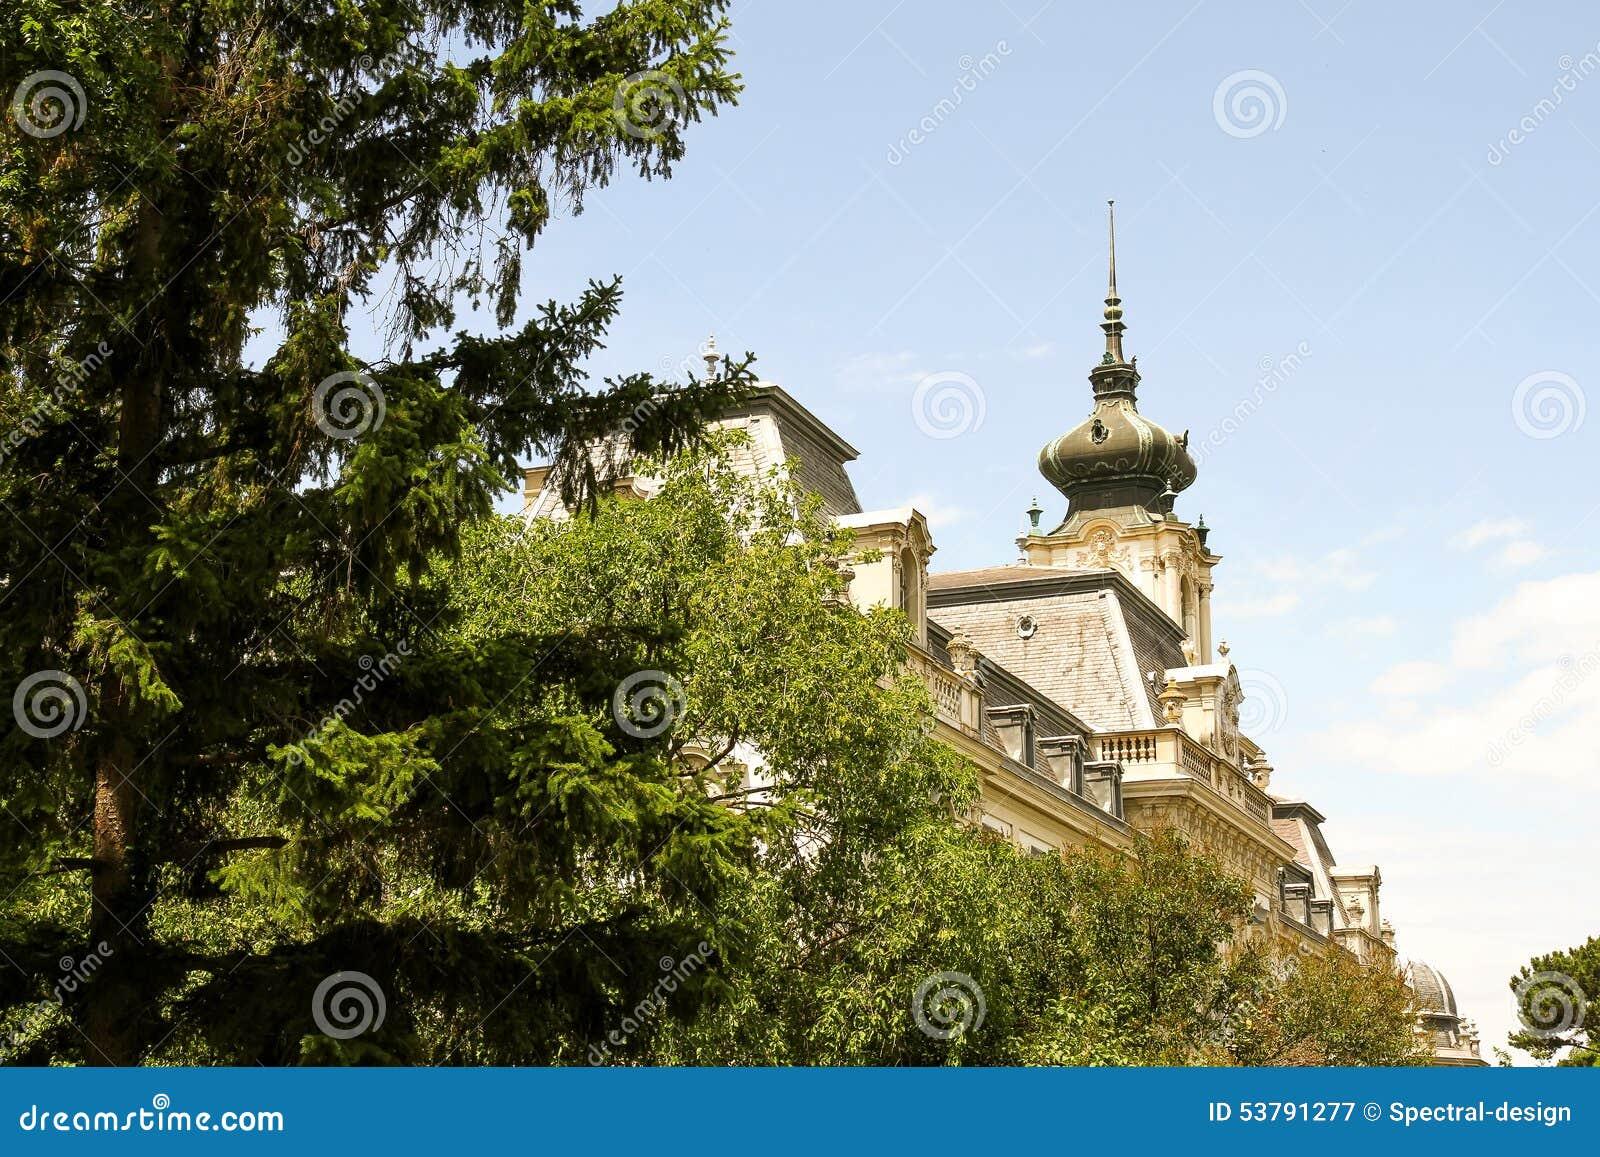 Sławny kasztel w Keszthely